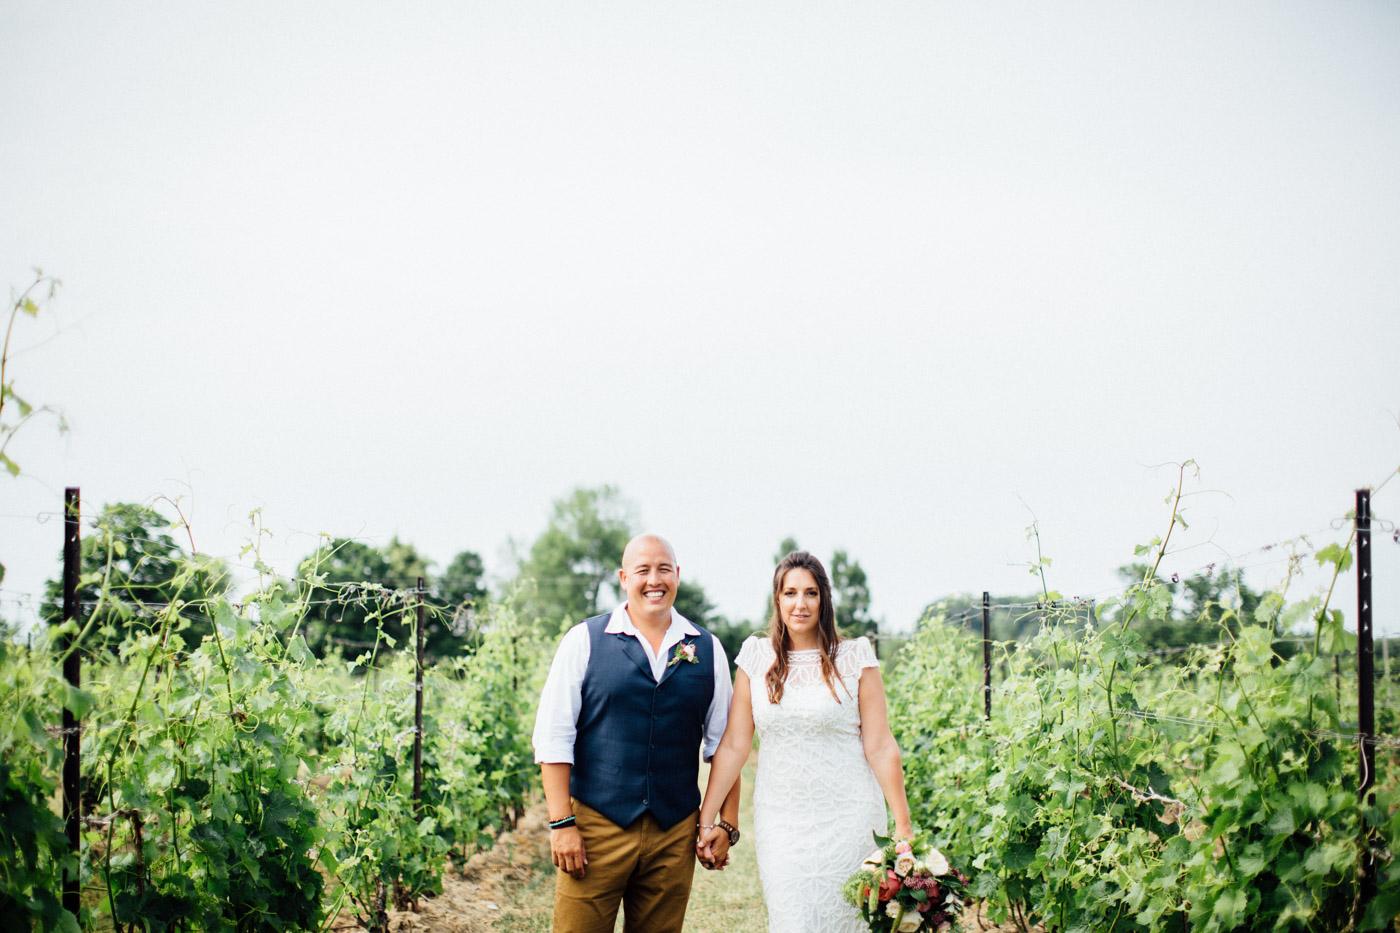 Thera & Barry Wedding 2016-422.jpg